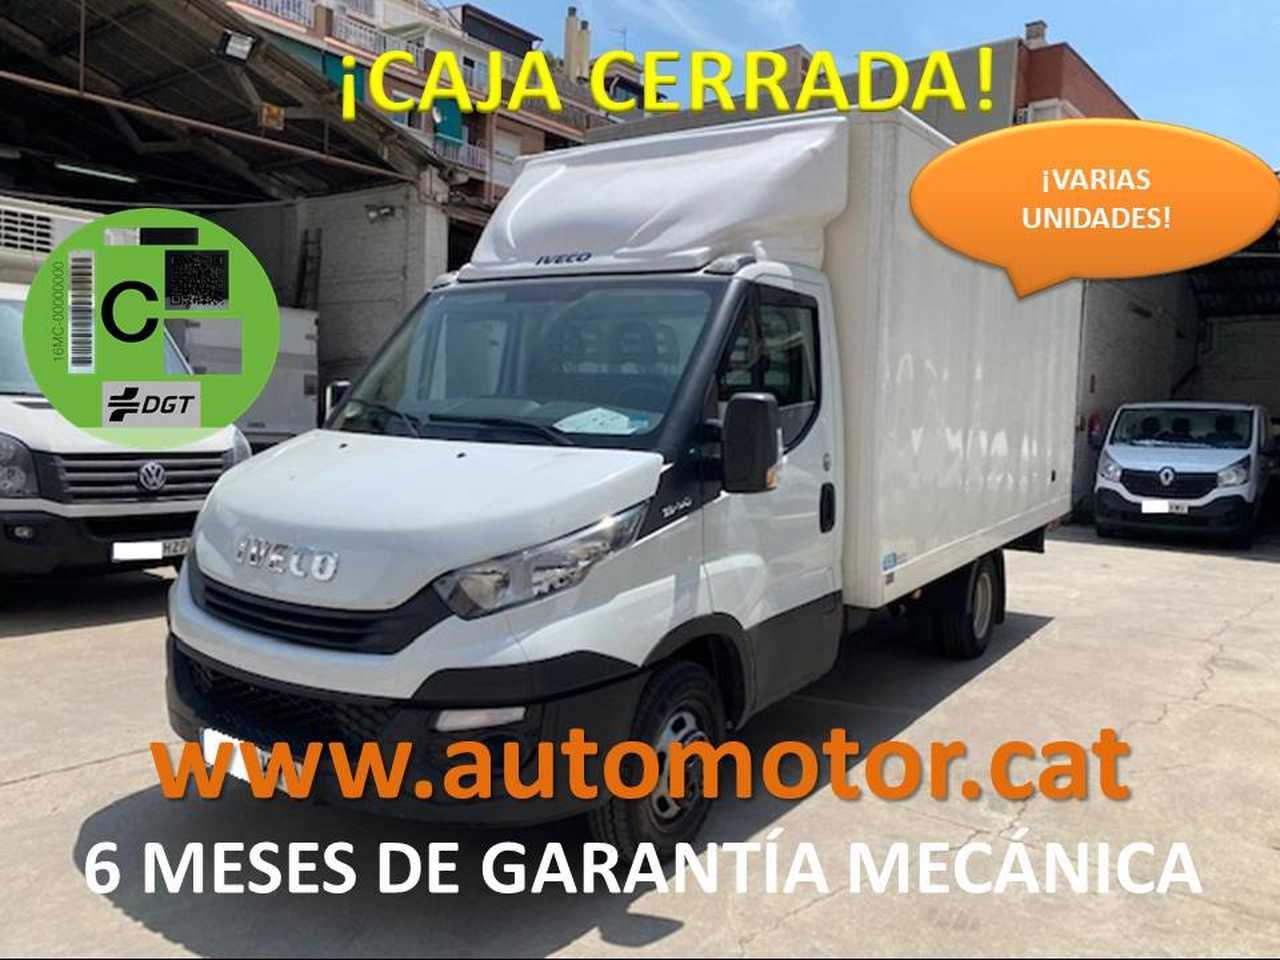 Iveco Daily Chasis Cabina 35C14 3450 136 - GARANTIA MECANICA  - Foto 1